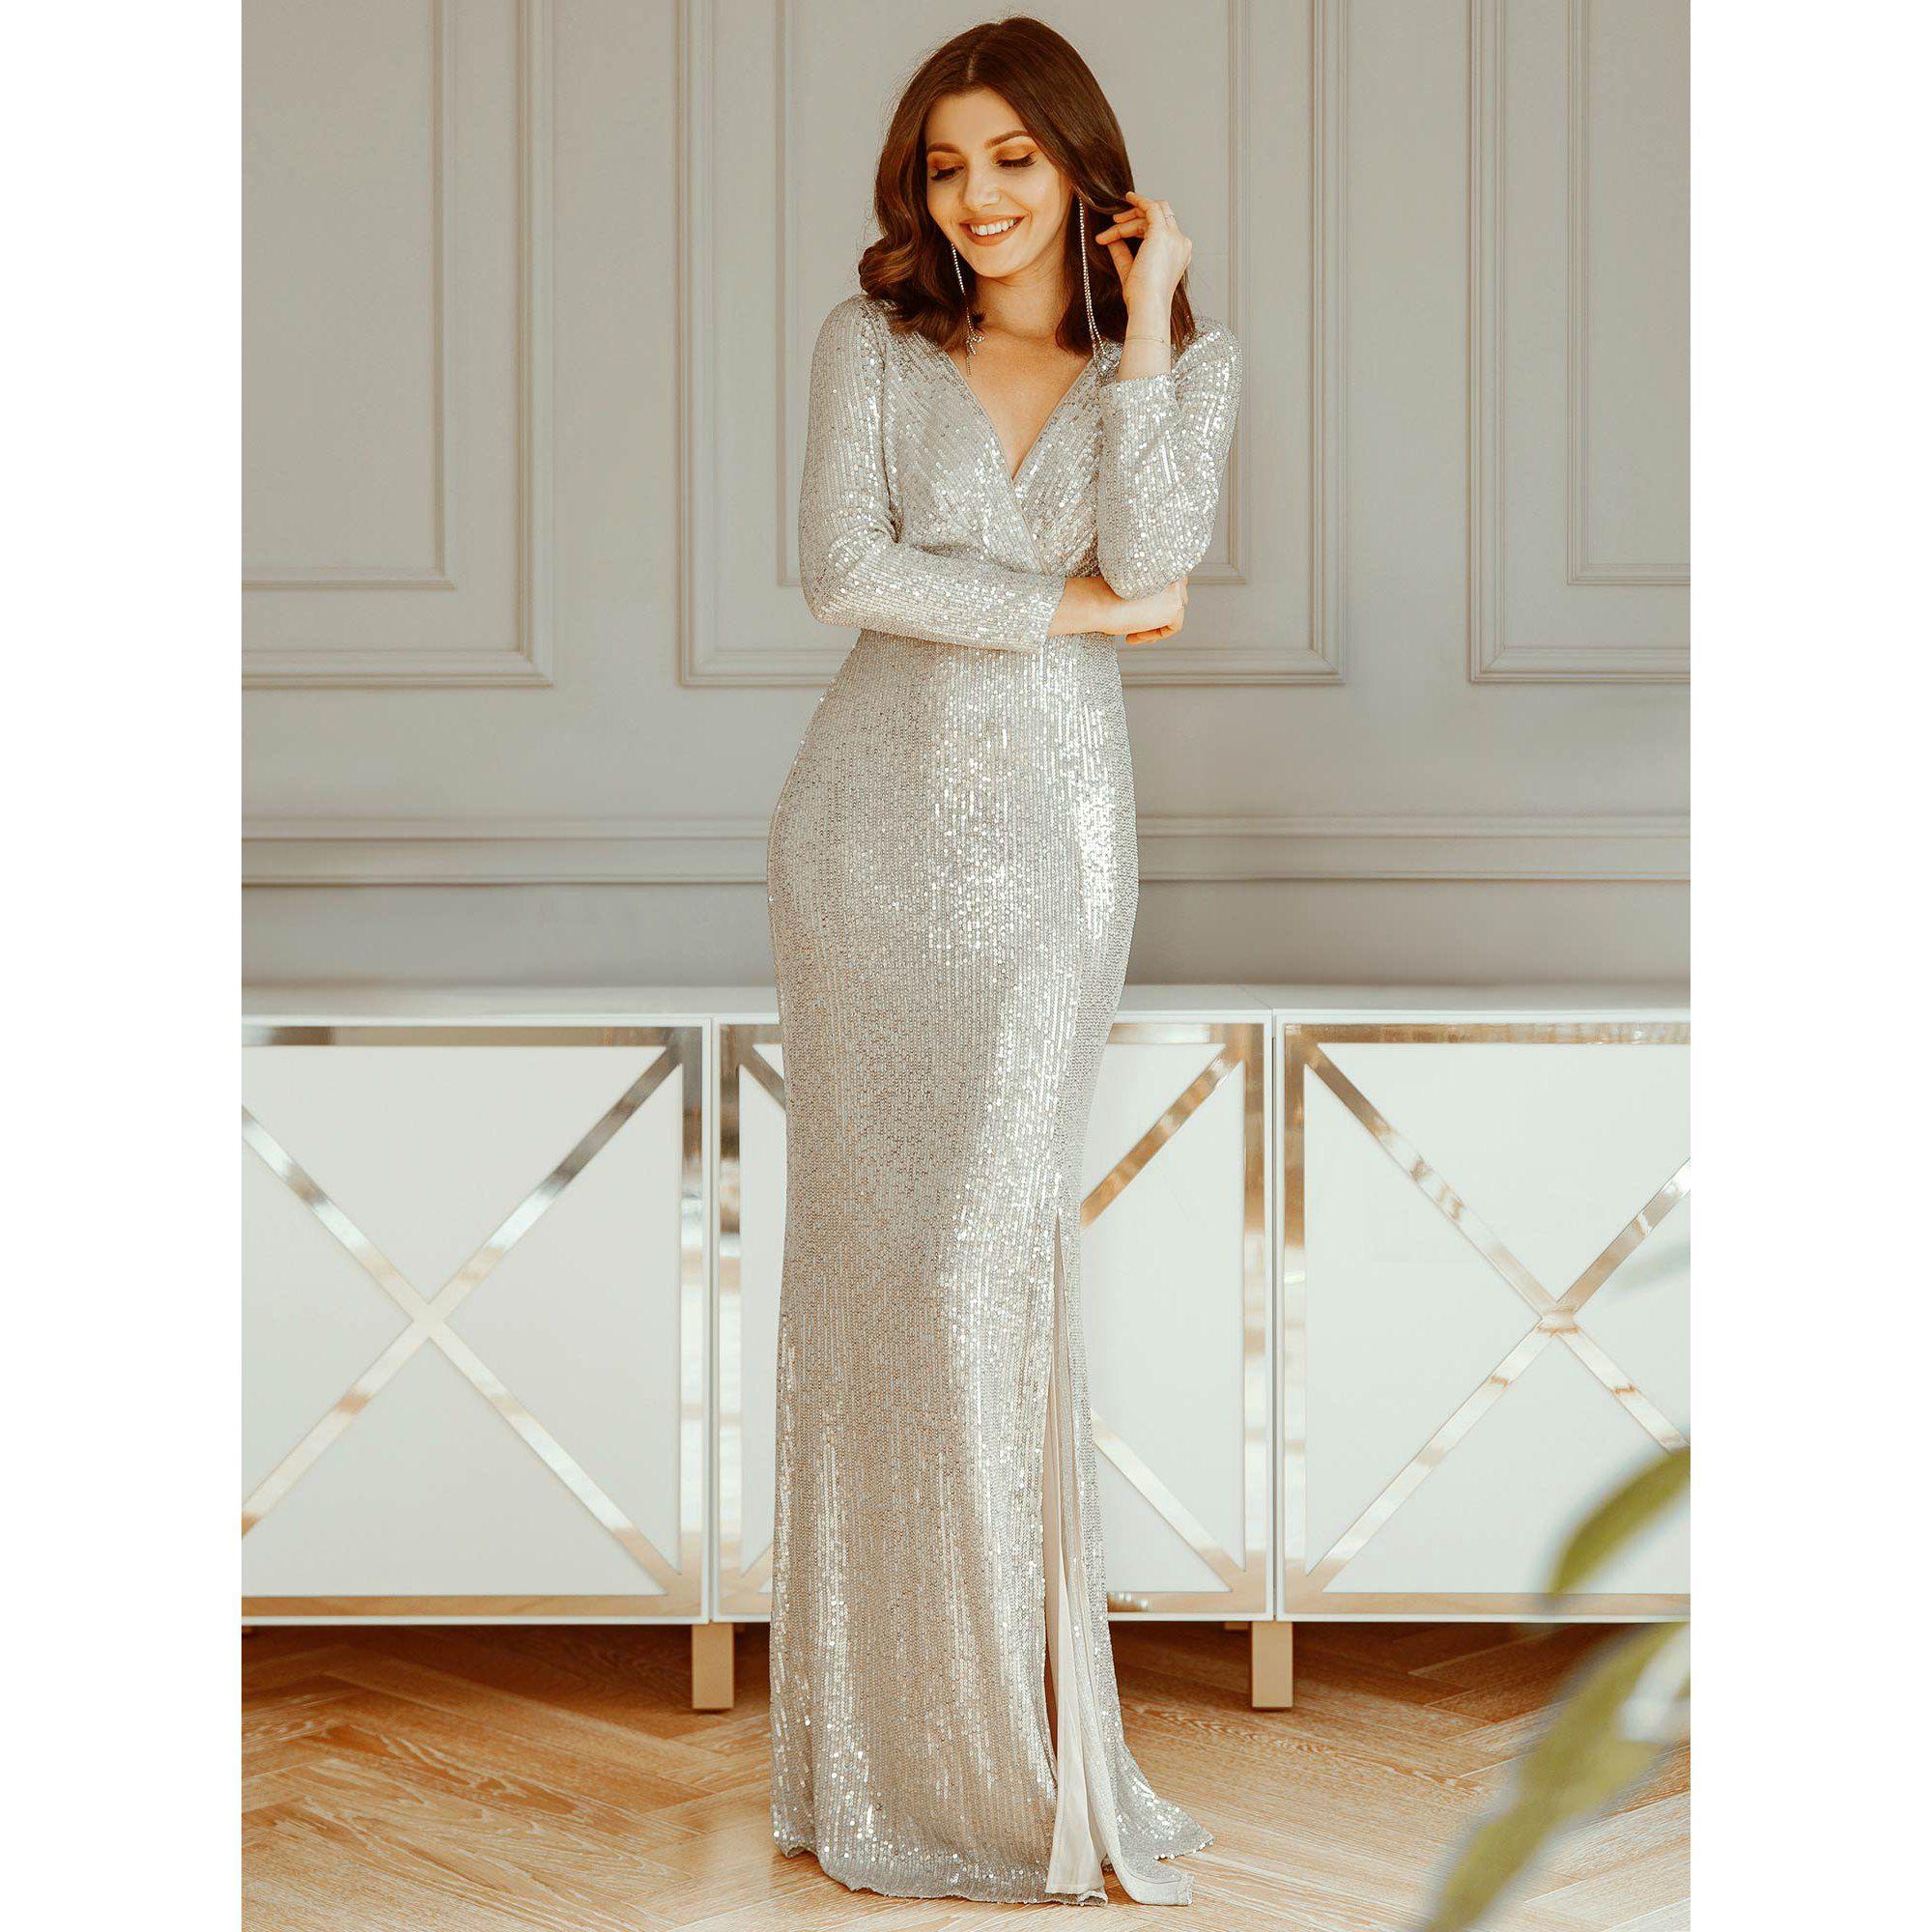 Ever Pretty Ever Pretty Womens Elegant Sequin Formal Evening Prom Dresses For Women 00824 Us4 Walmart Com In 2021 Evening Dresses Elegant Fitted Prom Dresses Long Sleeve Evening Dresses [ 2000 x 2000 Pixel ]